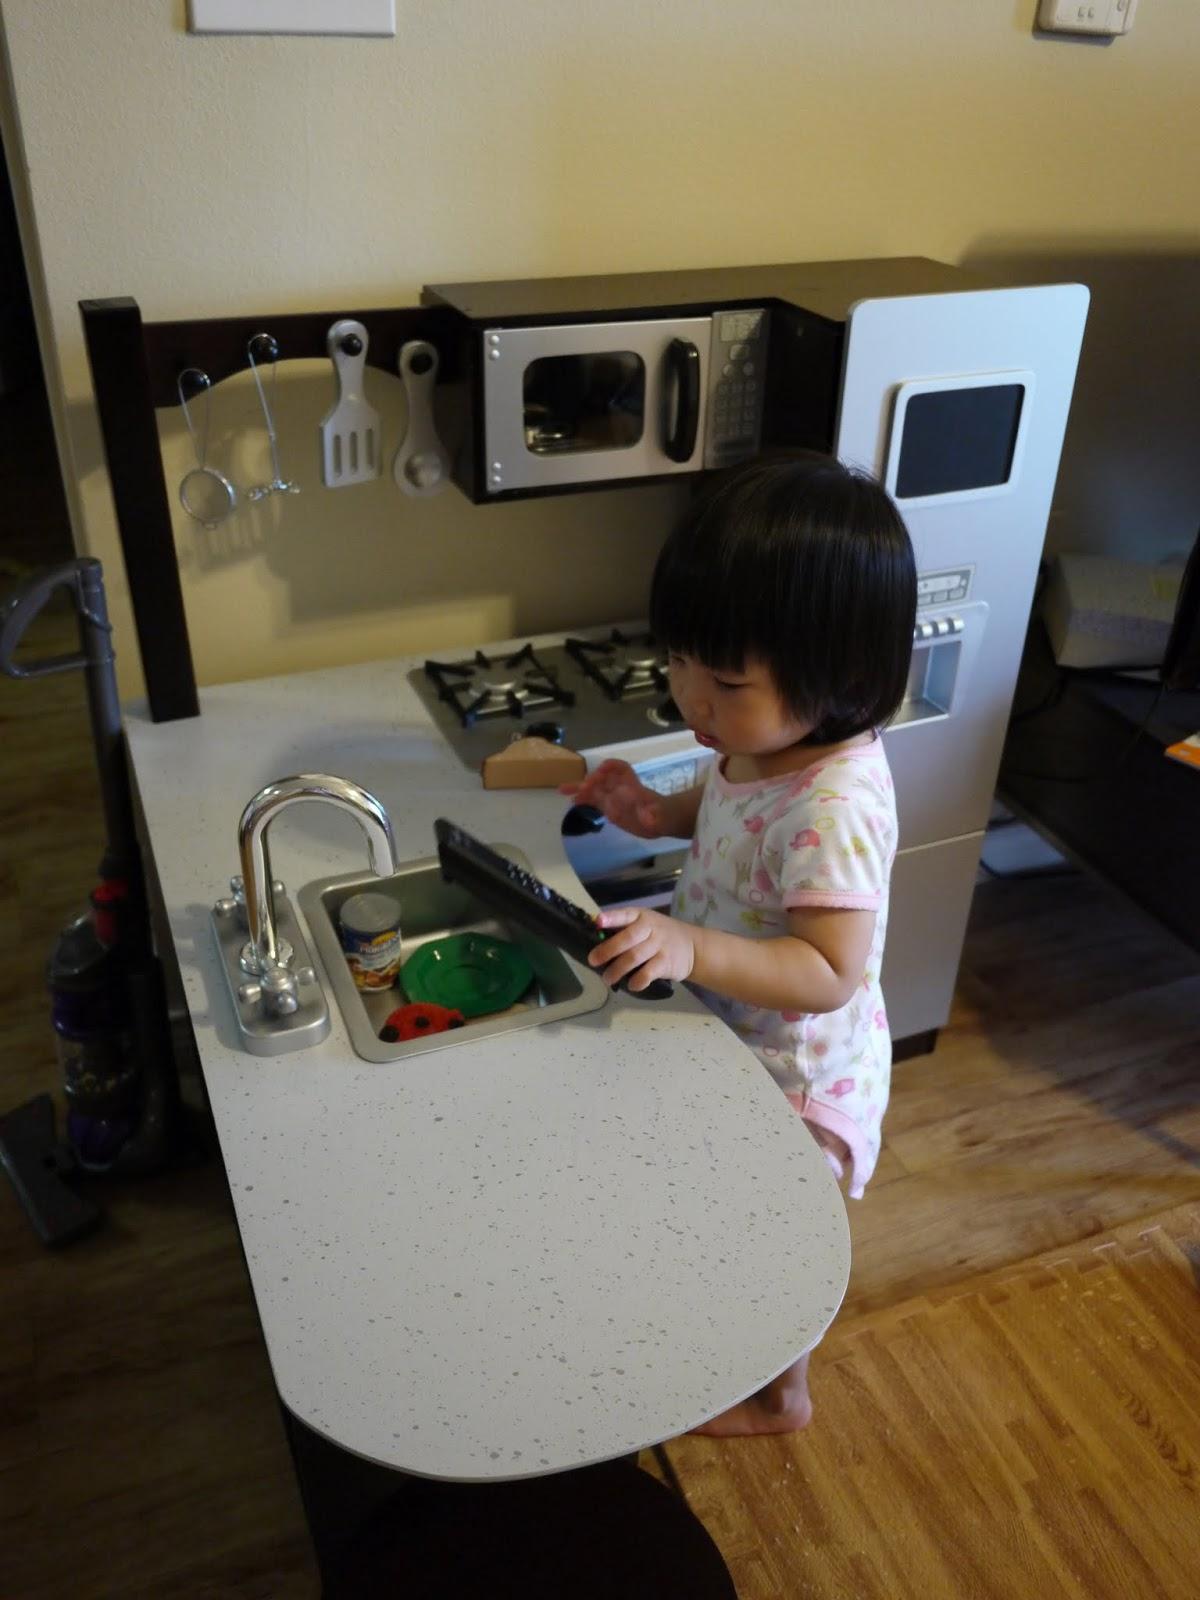 Kid Craft Kitchen Led Light Live Love Laugh 1y6m 玩具篇 Kidkraft 小廚房 畫圖桌 Mini Dyson吸塵器 木製拼圖